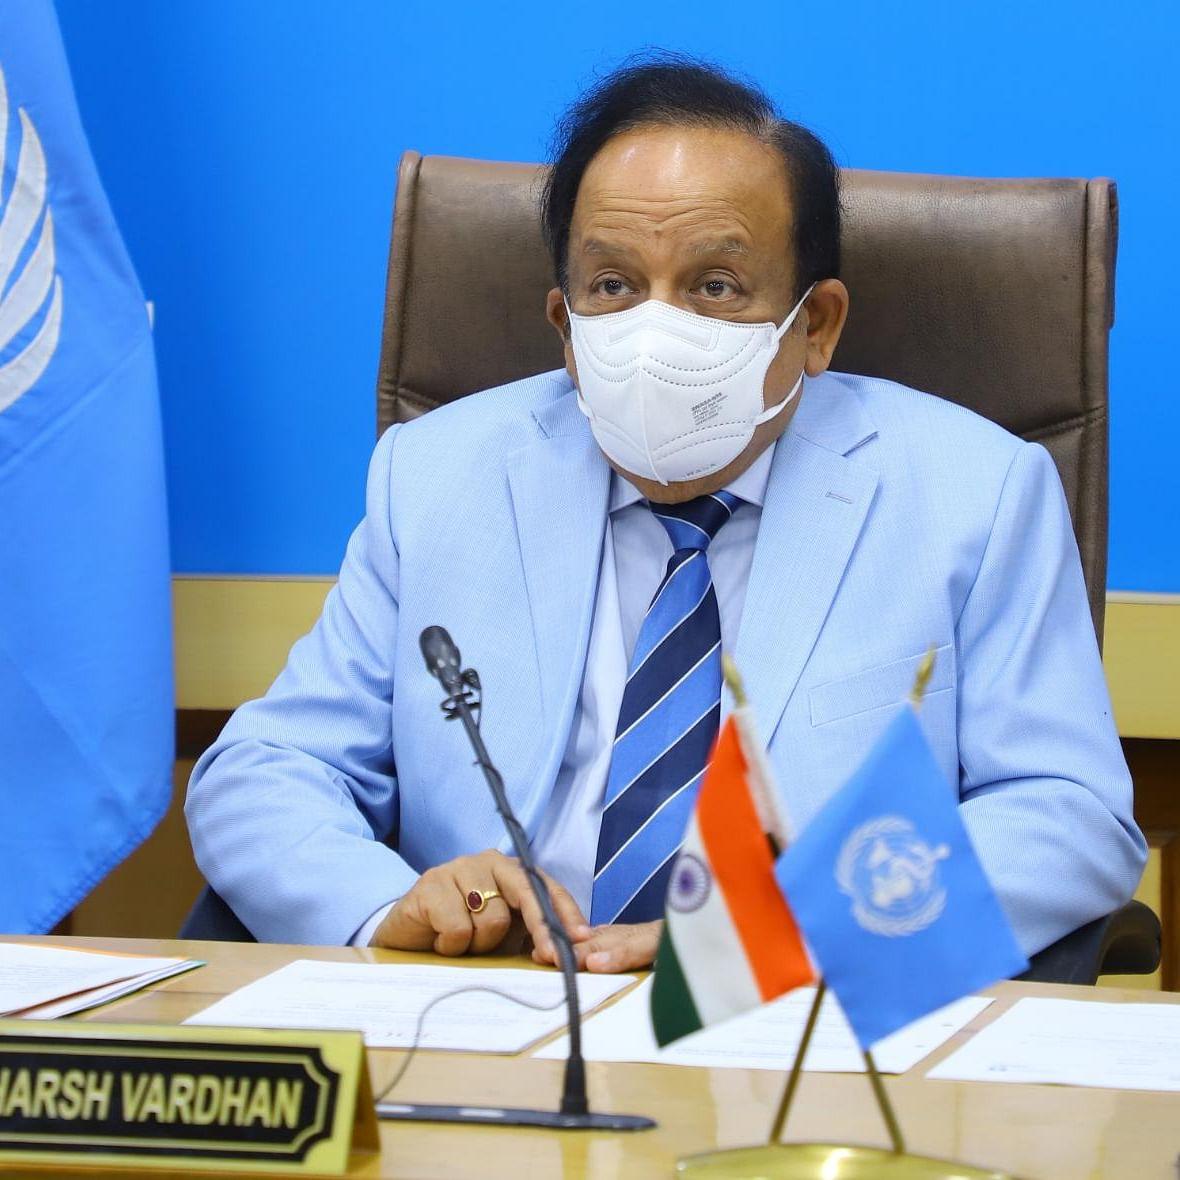 COVID-19: India opposes vaccine passport, calls it 'highly discriminatory'